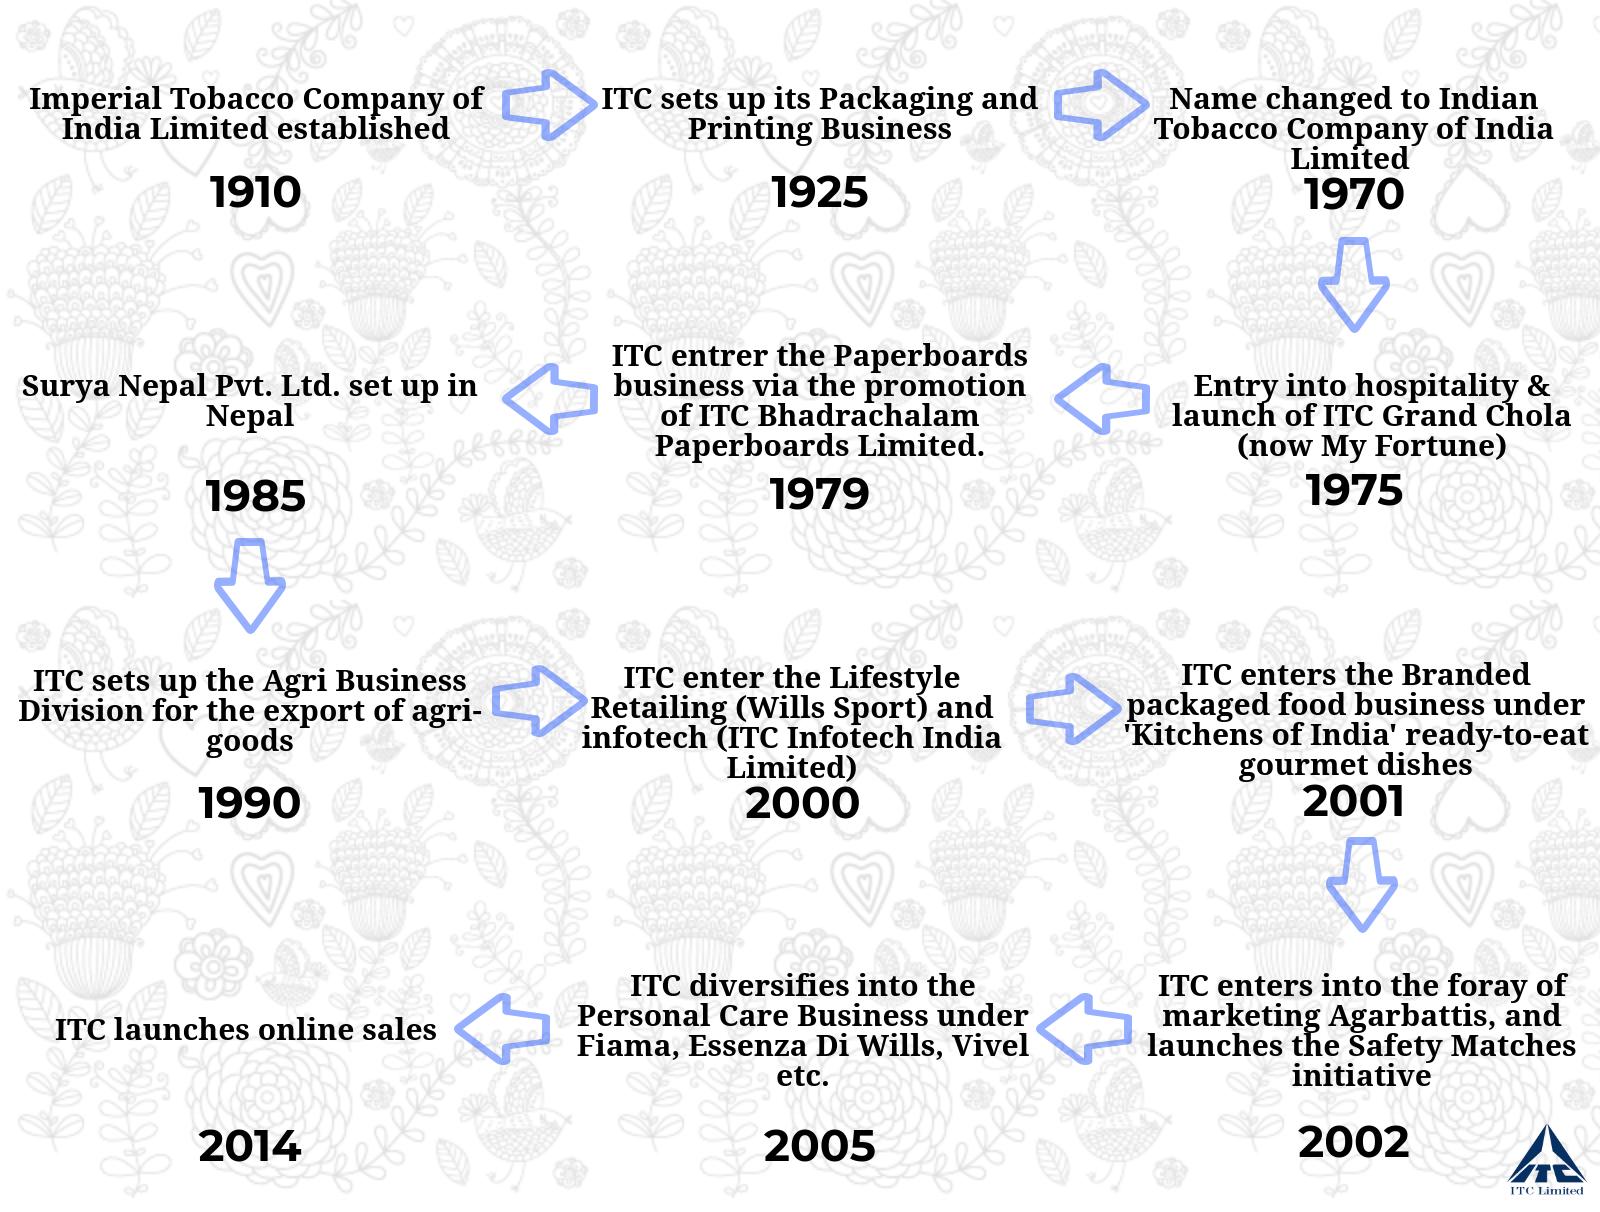 ITC - A Brief History